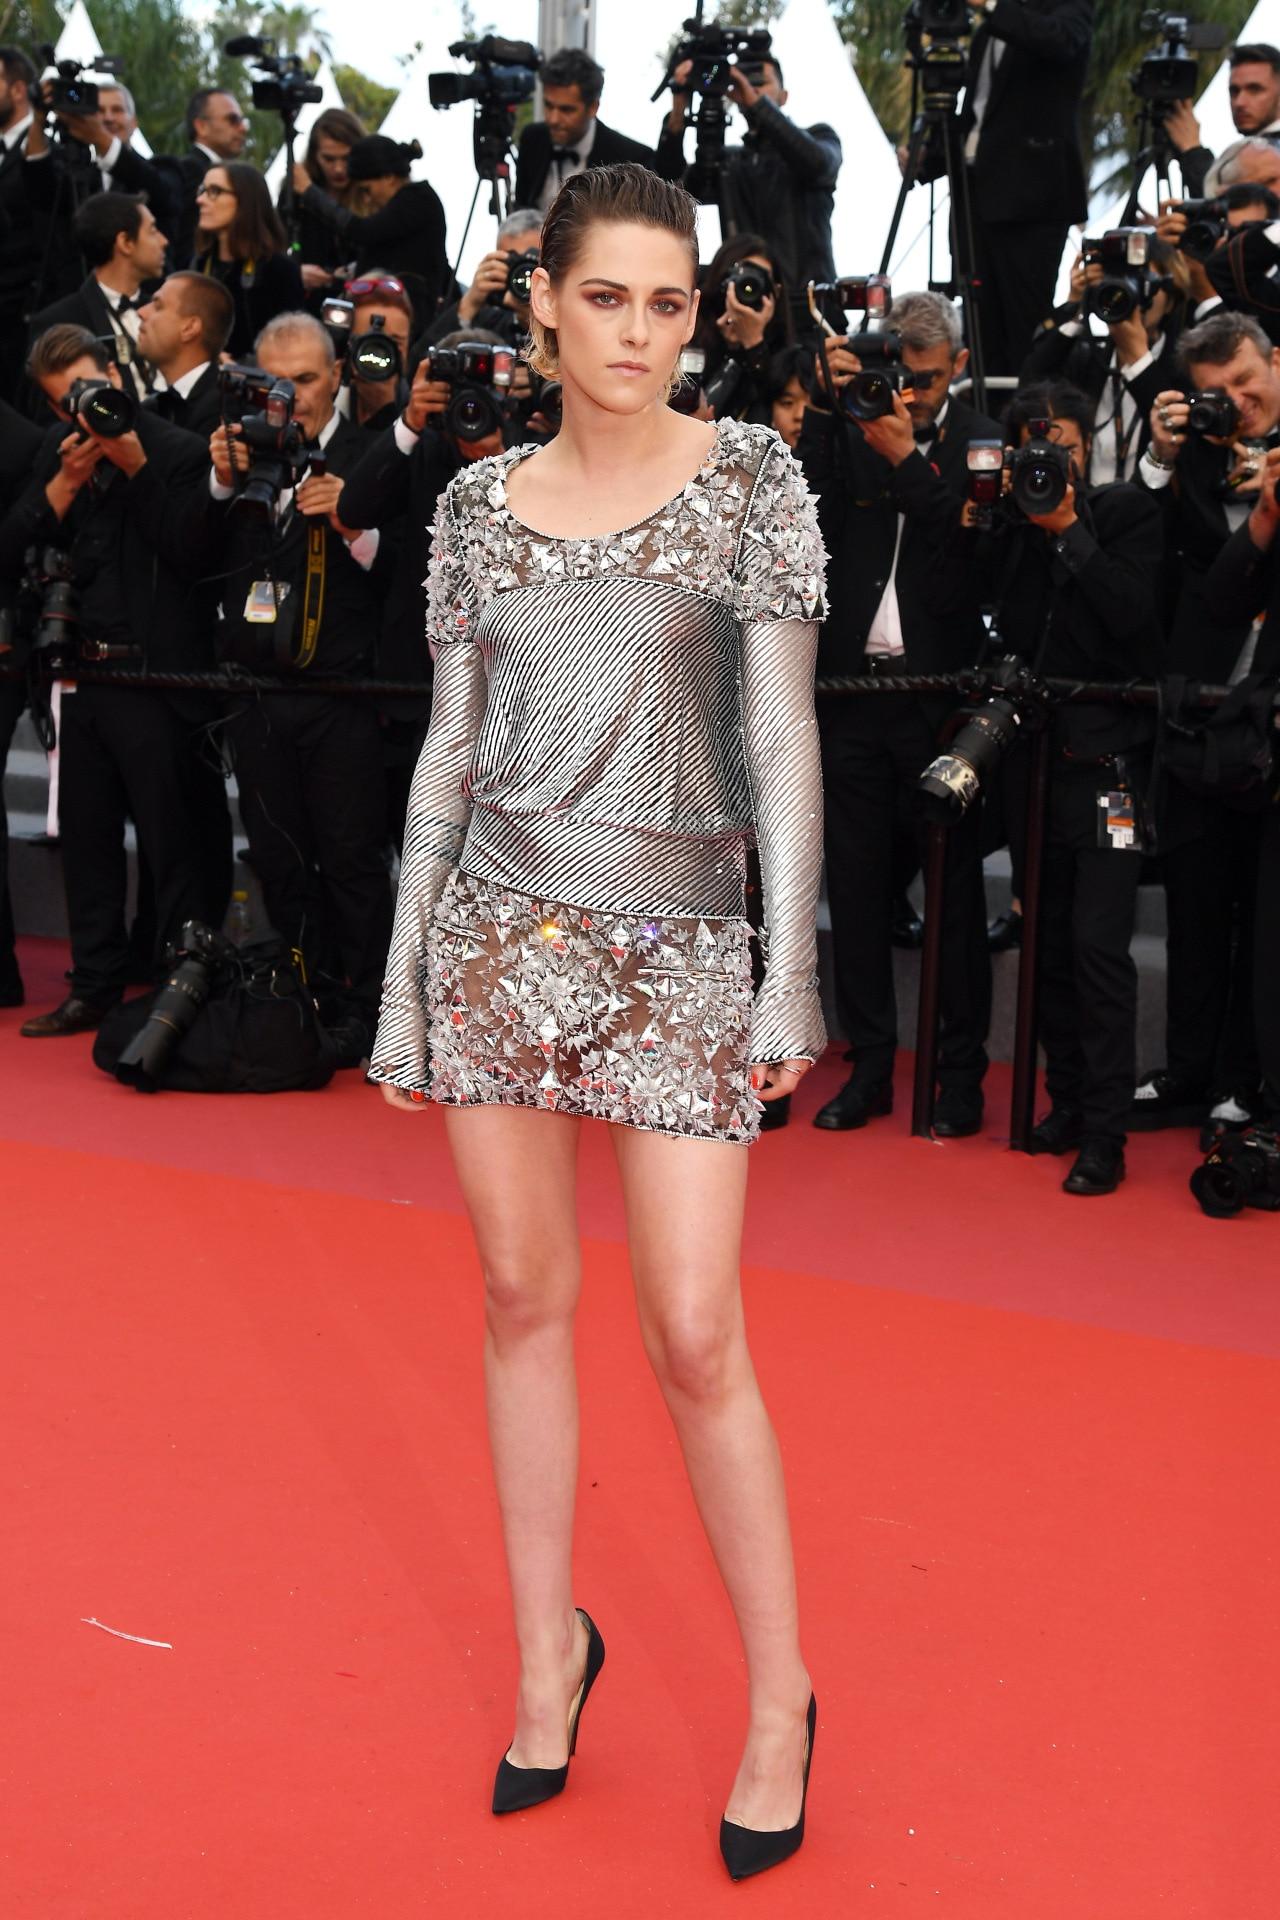 Kristen Stewart has a new girlfriend and she's a stylist